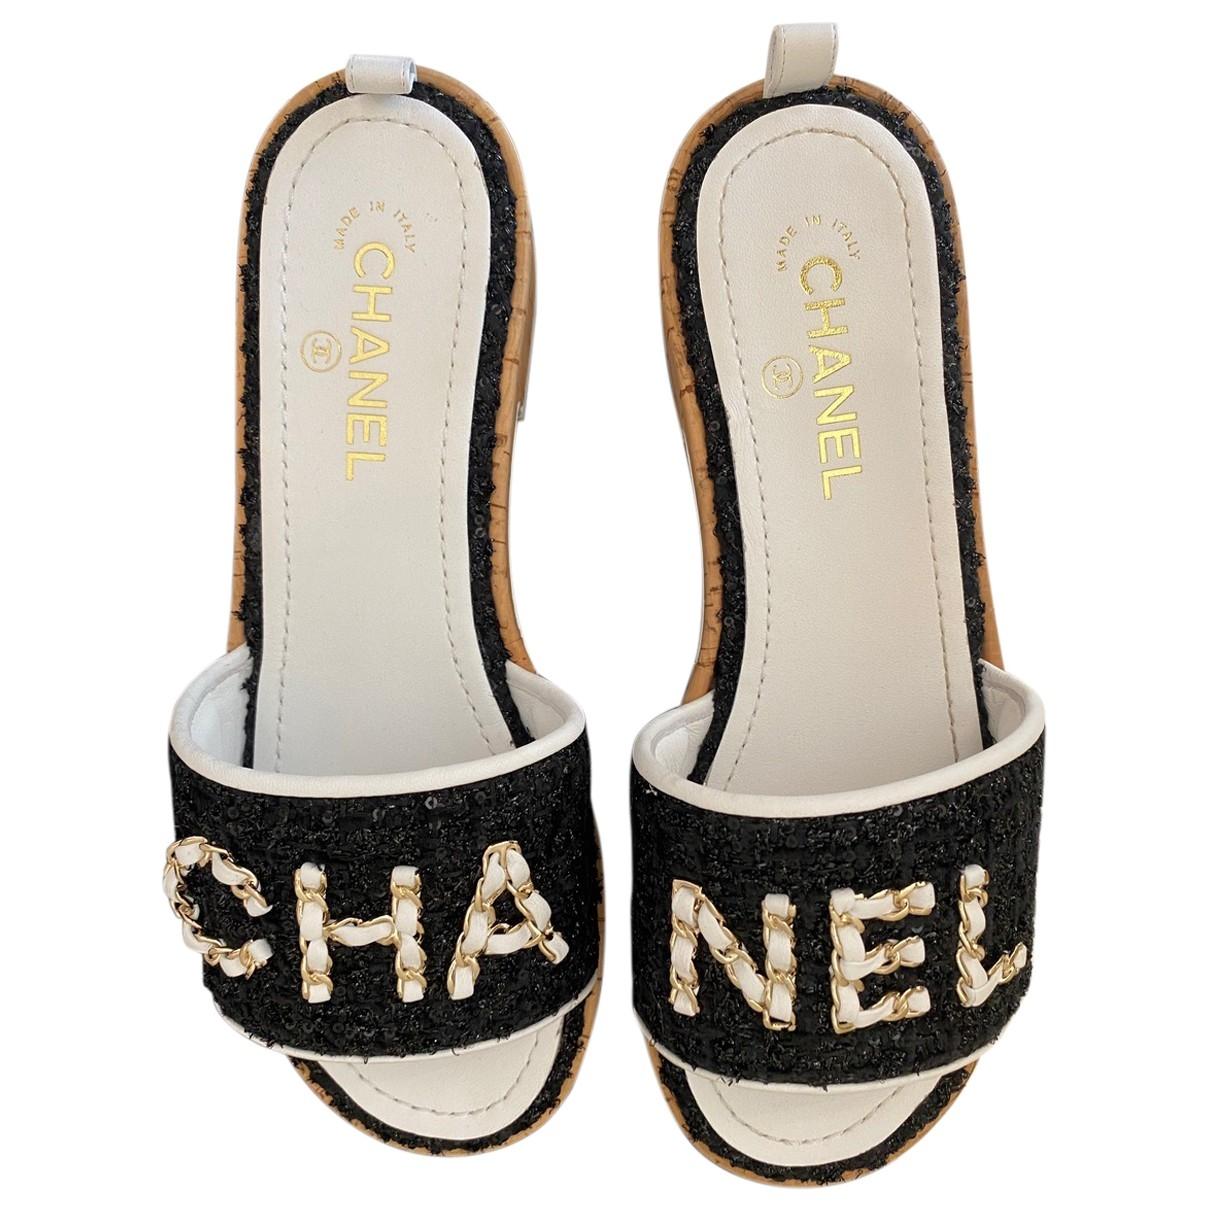 Zuecos Tweed Chanel